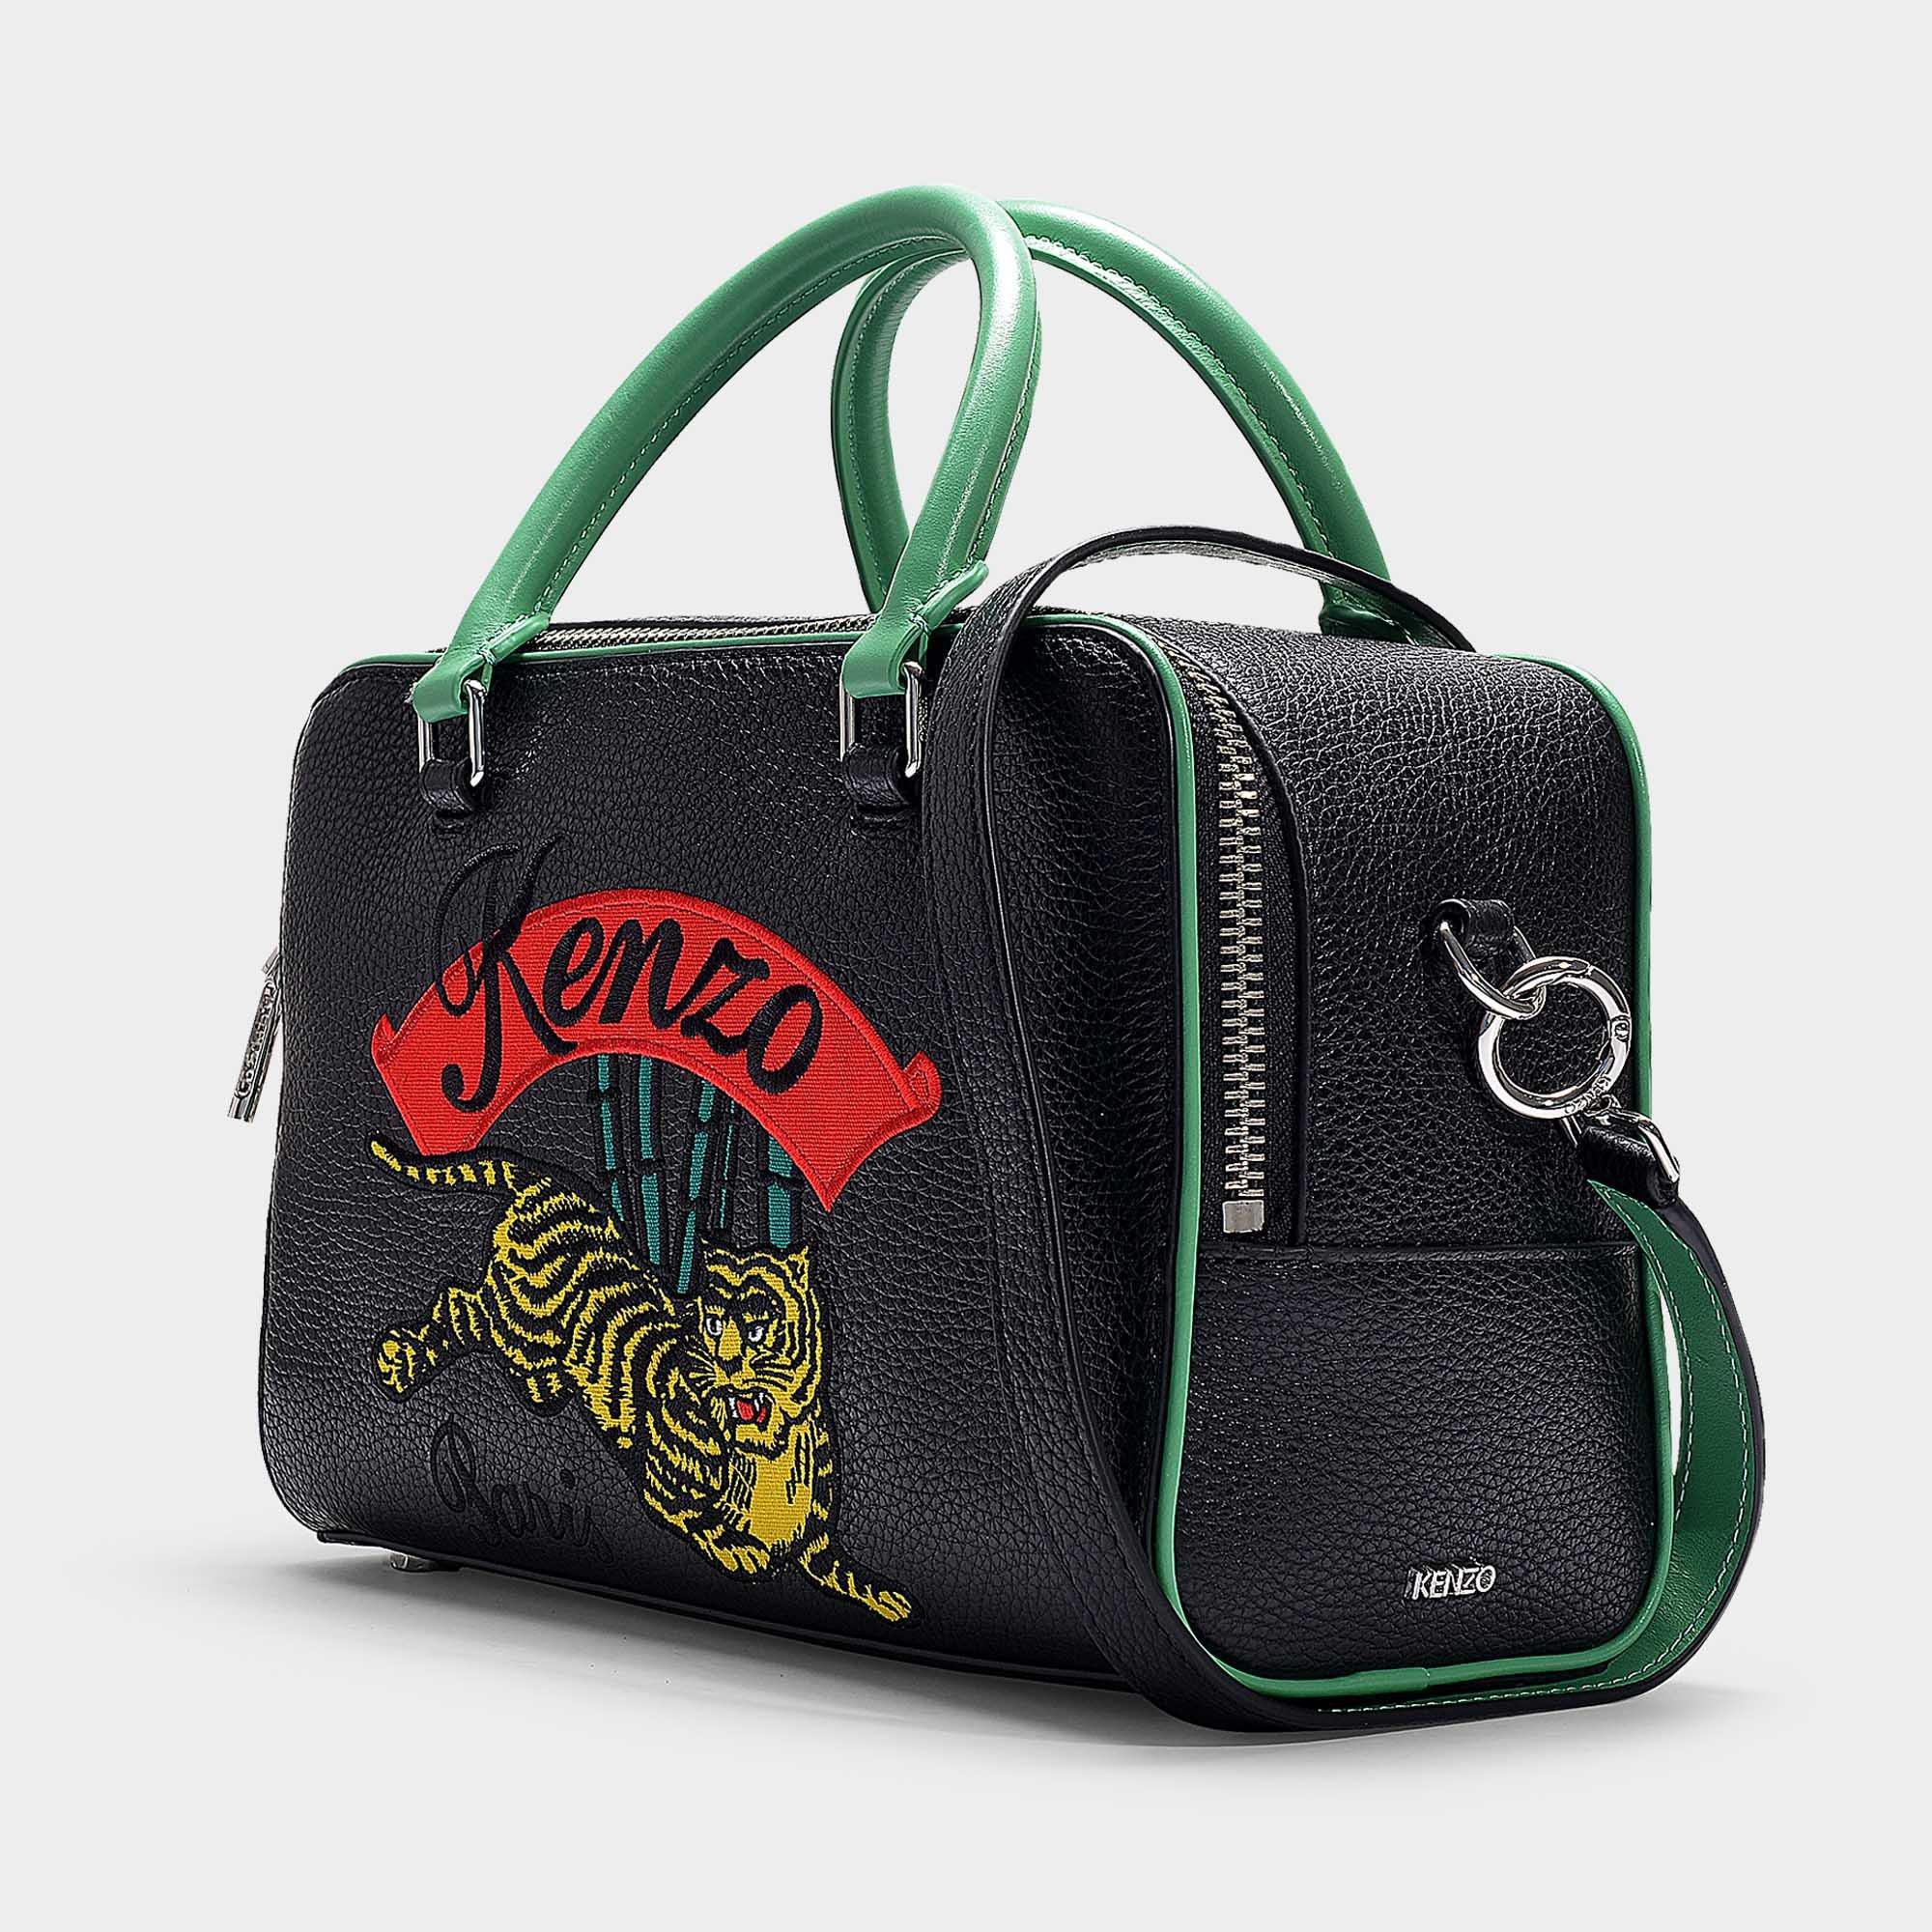 fcaf66742 KENZO Jumping Tiger Large Crossbody Bag In Black Calfskin in Black ...